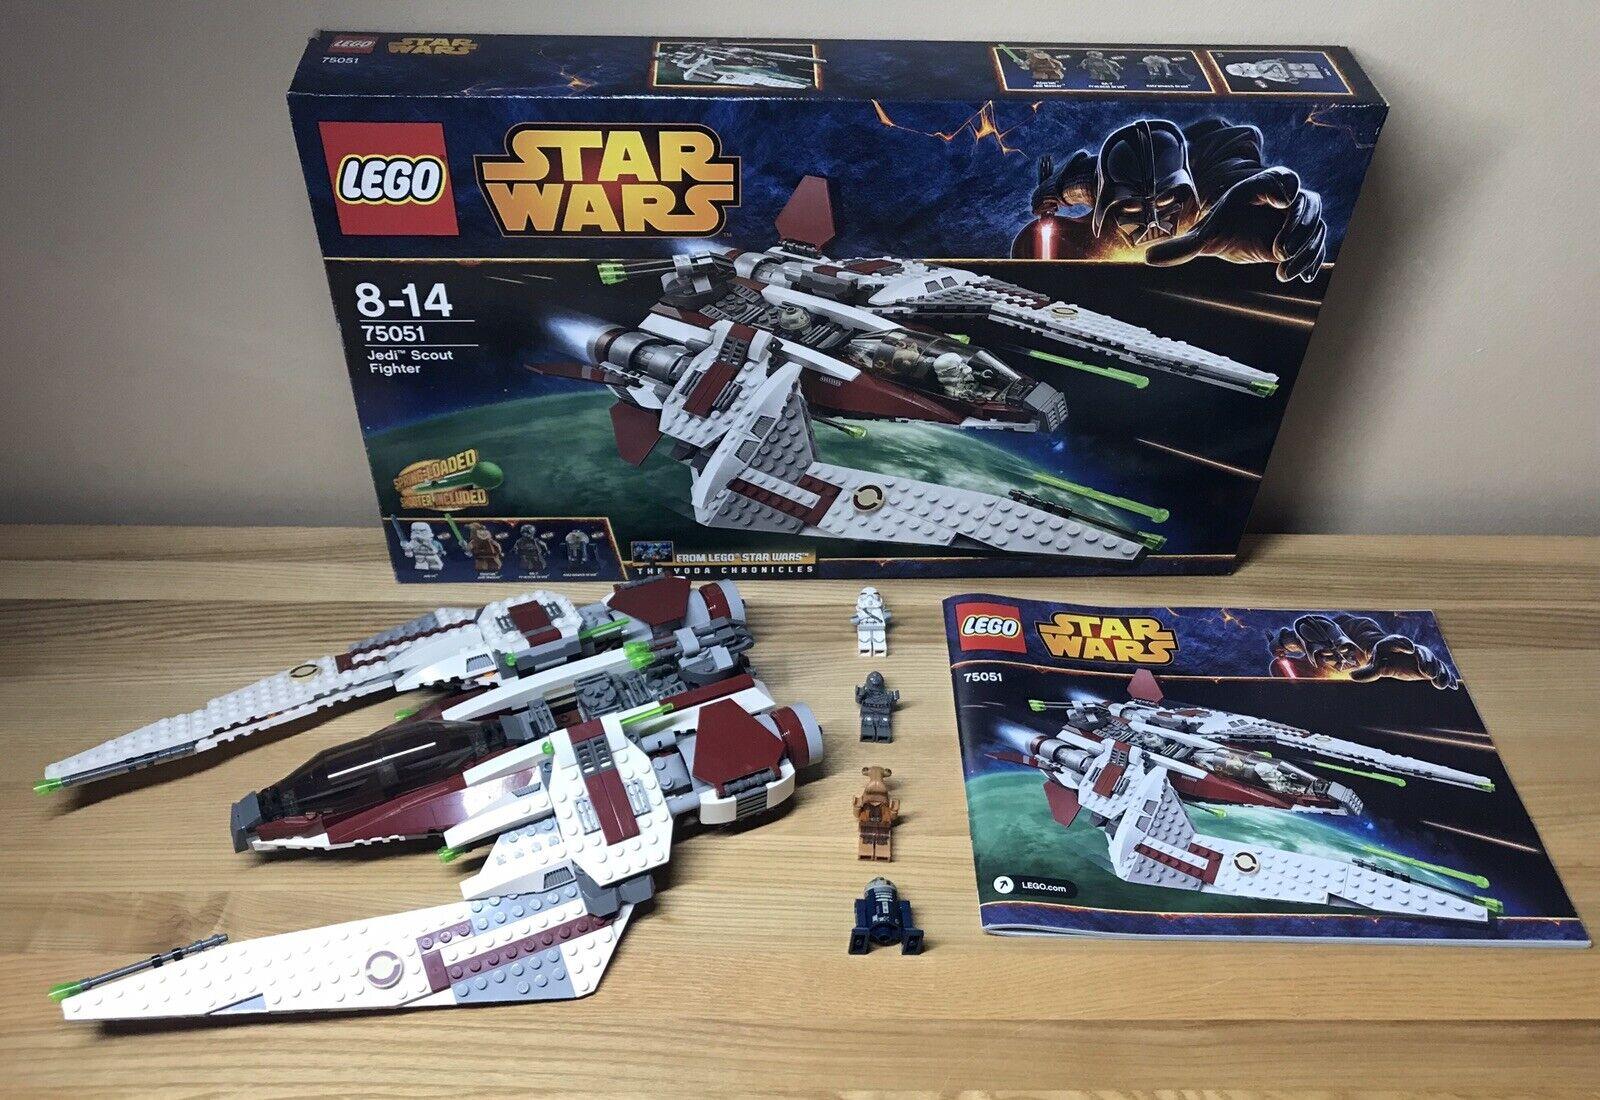 LEGO 75051 Stern Wars Jedi Scout Fighter Jek-14& Ithorian Jedi RA-7